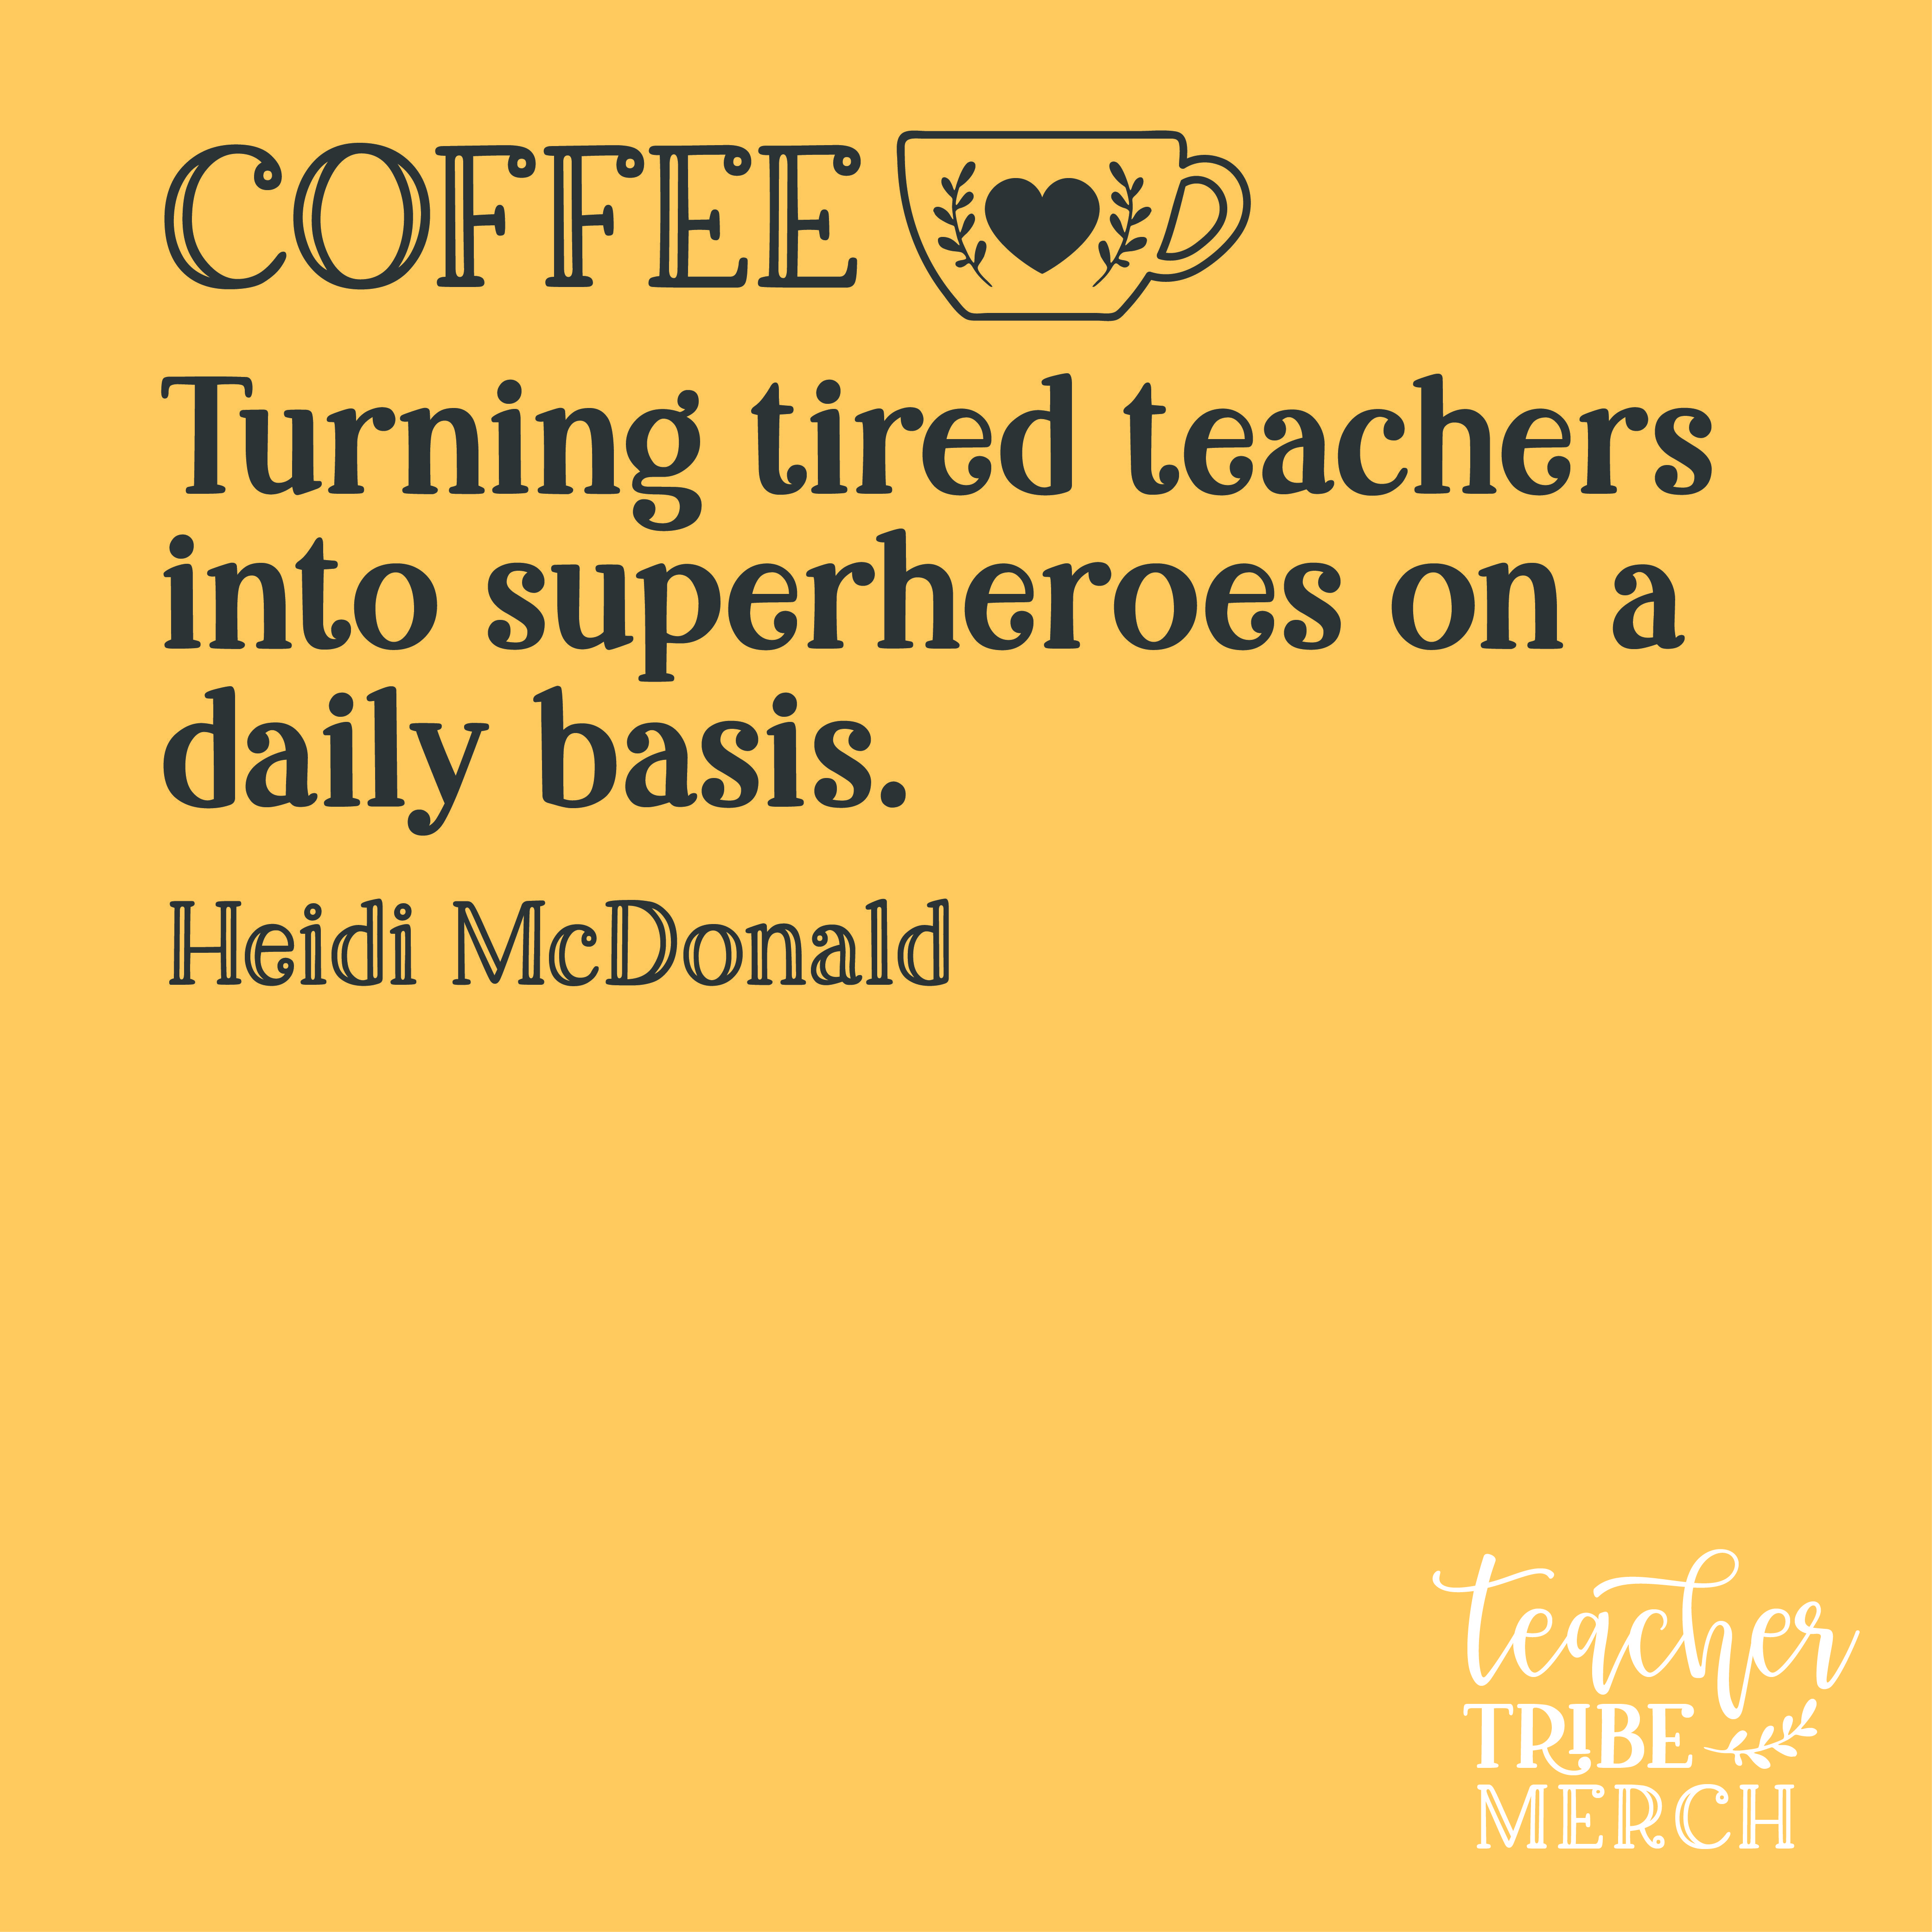 Funny Teacher Coffee Quote Teacher Tired Teacher Quotes Teacher Humor